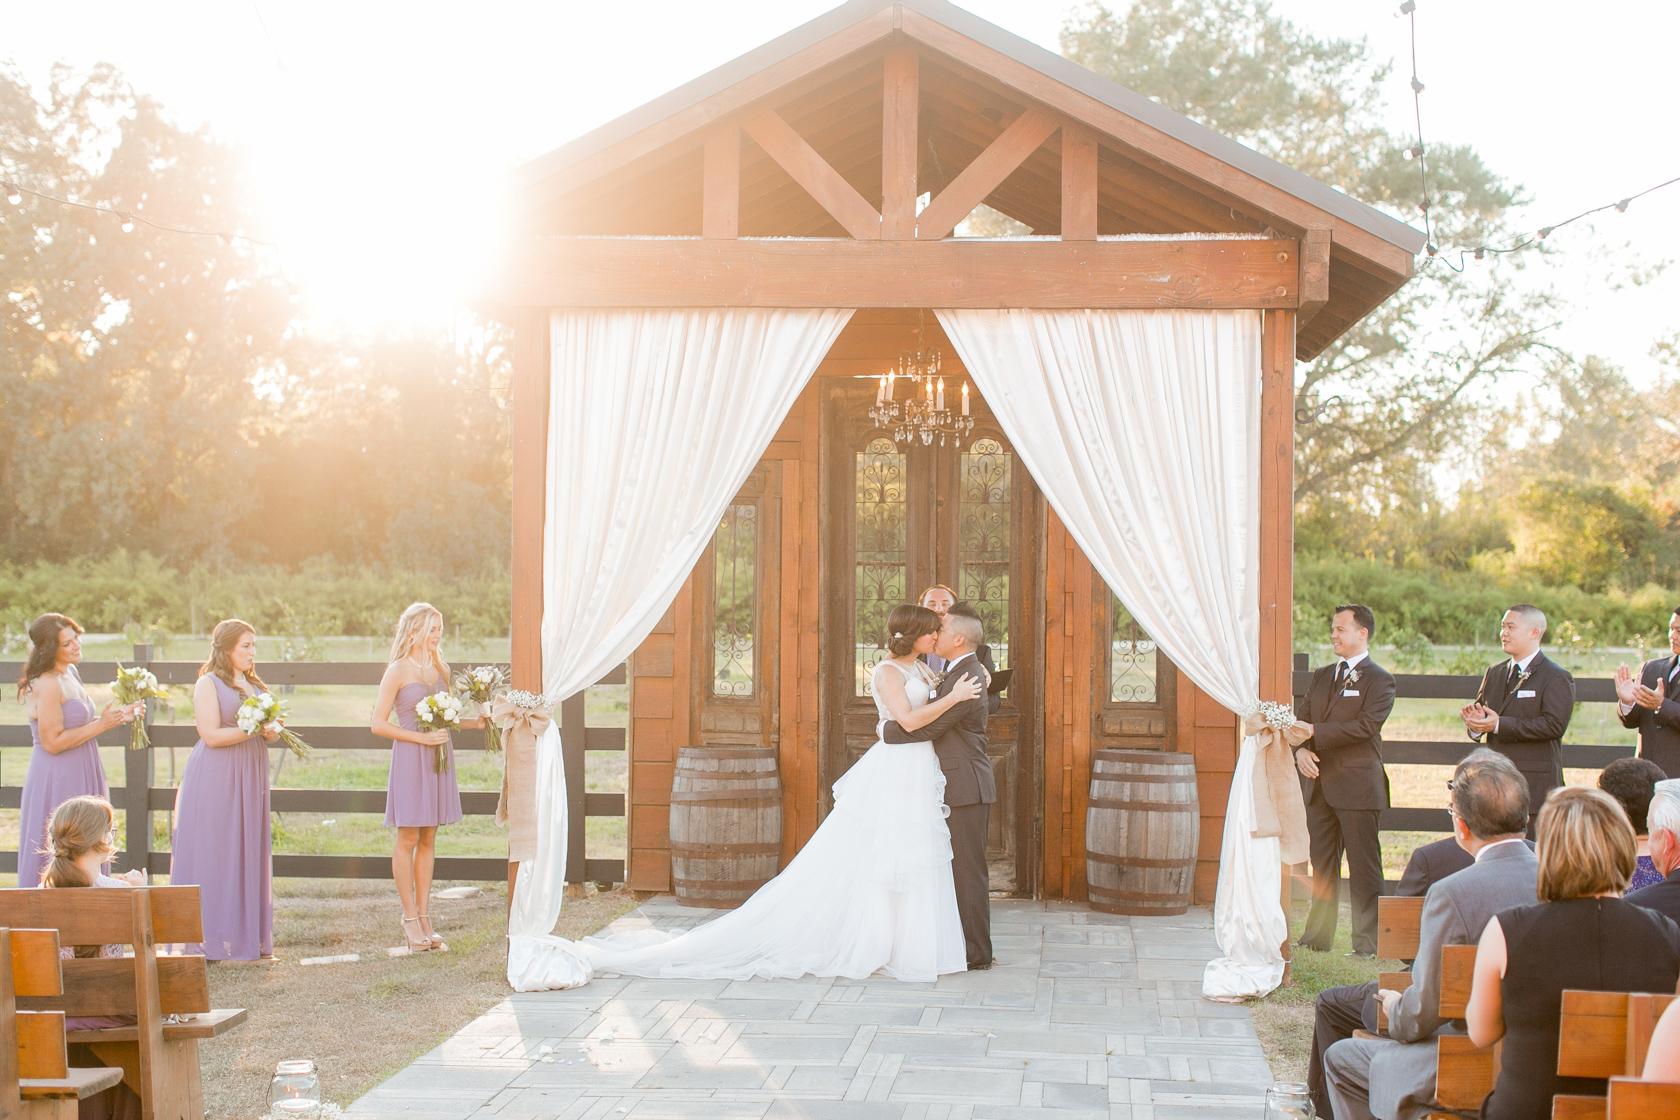 berry barn wedding ceremony - 05